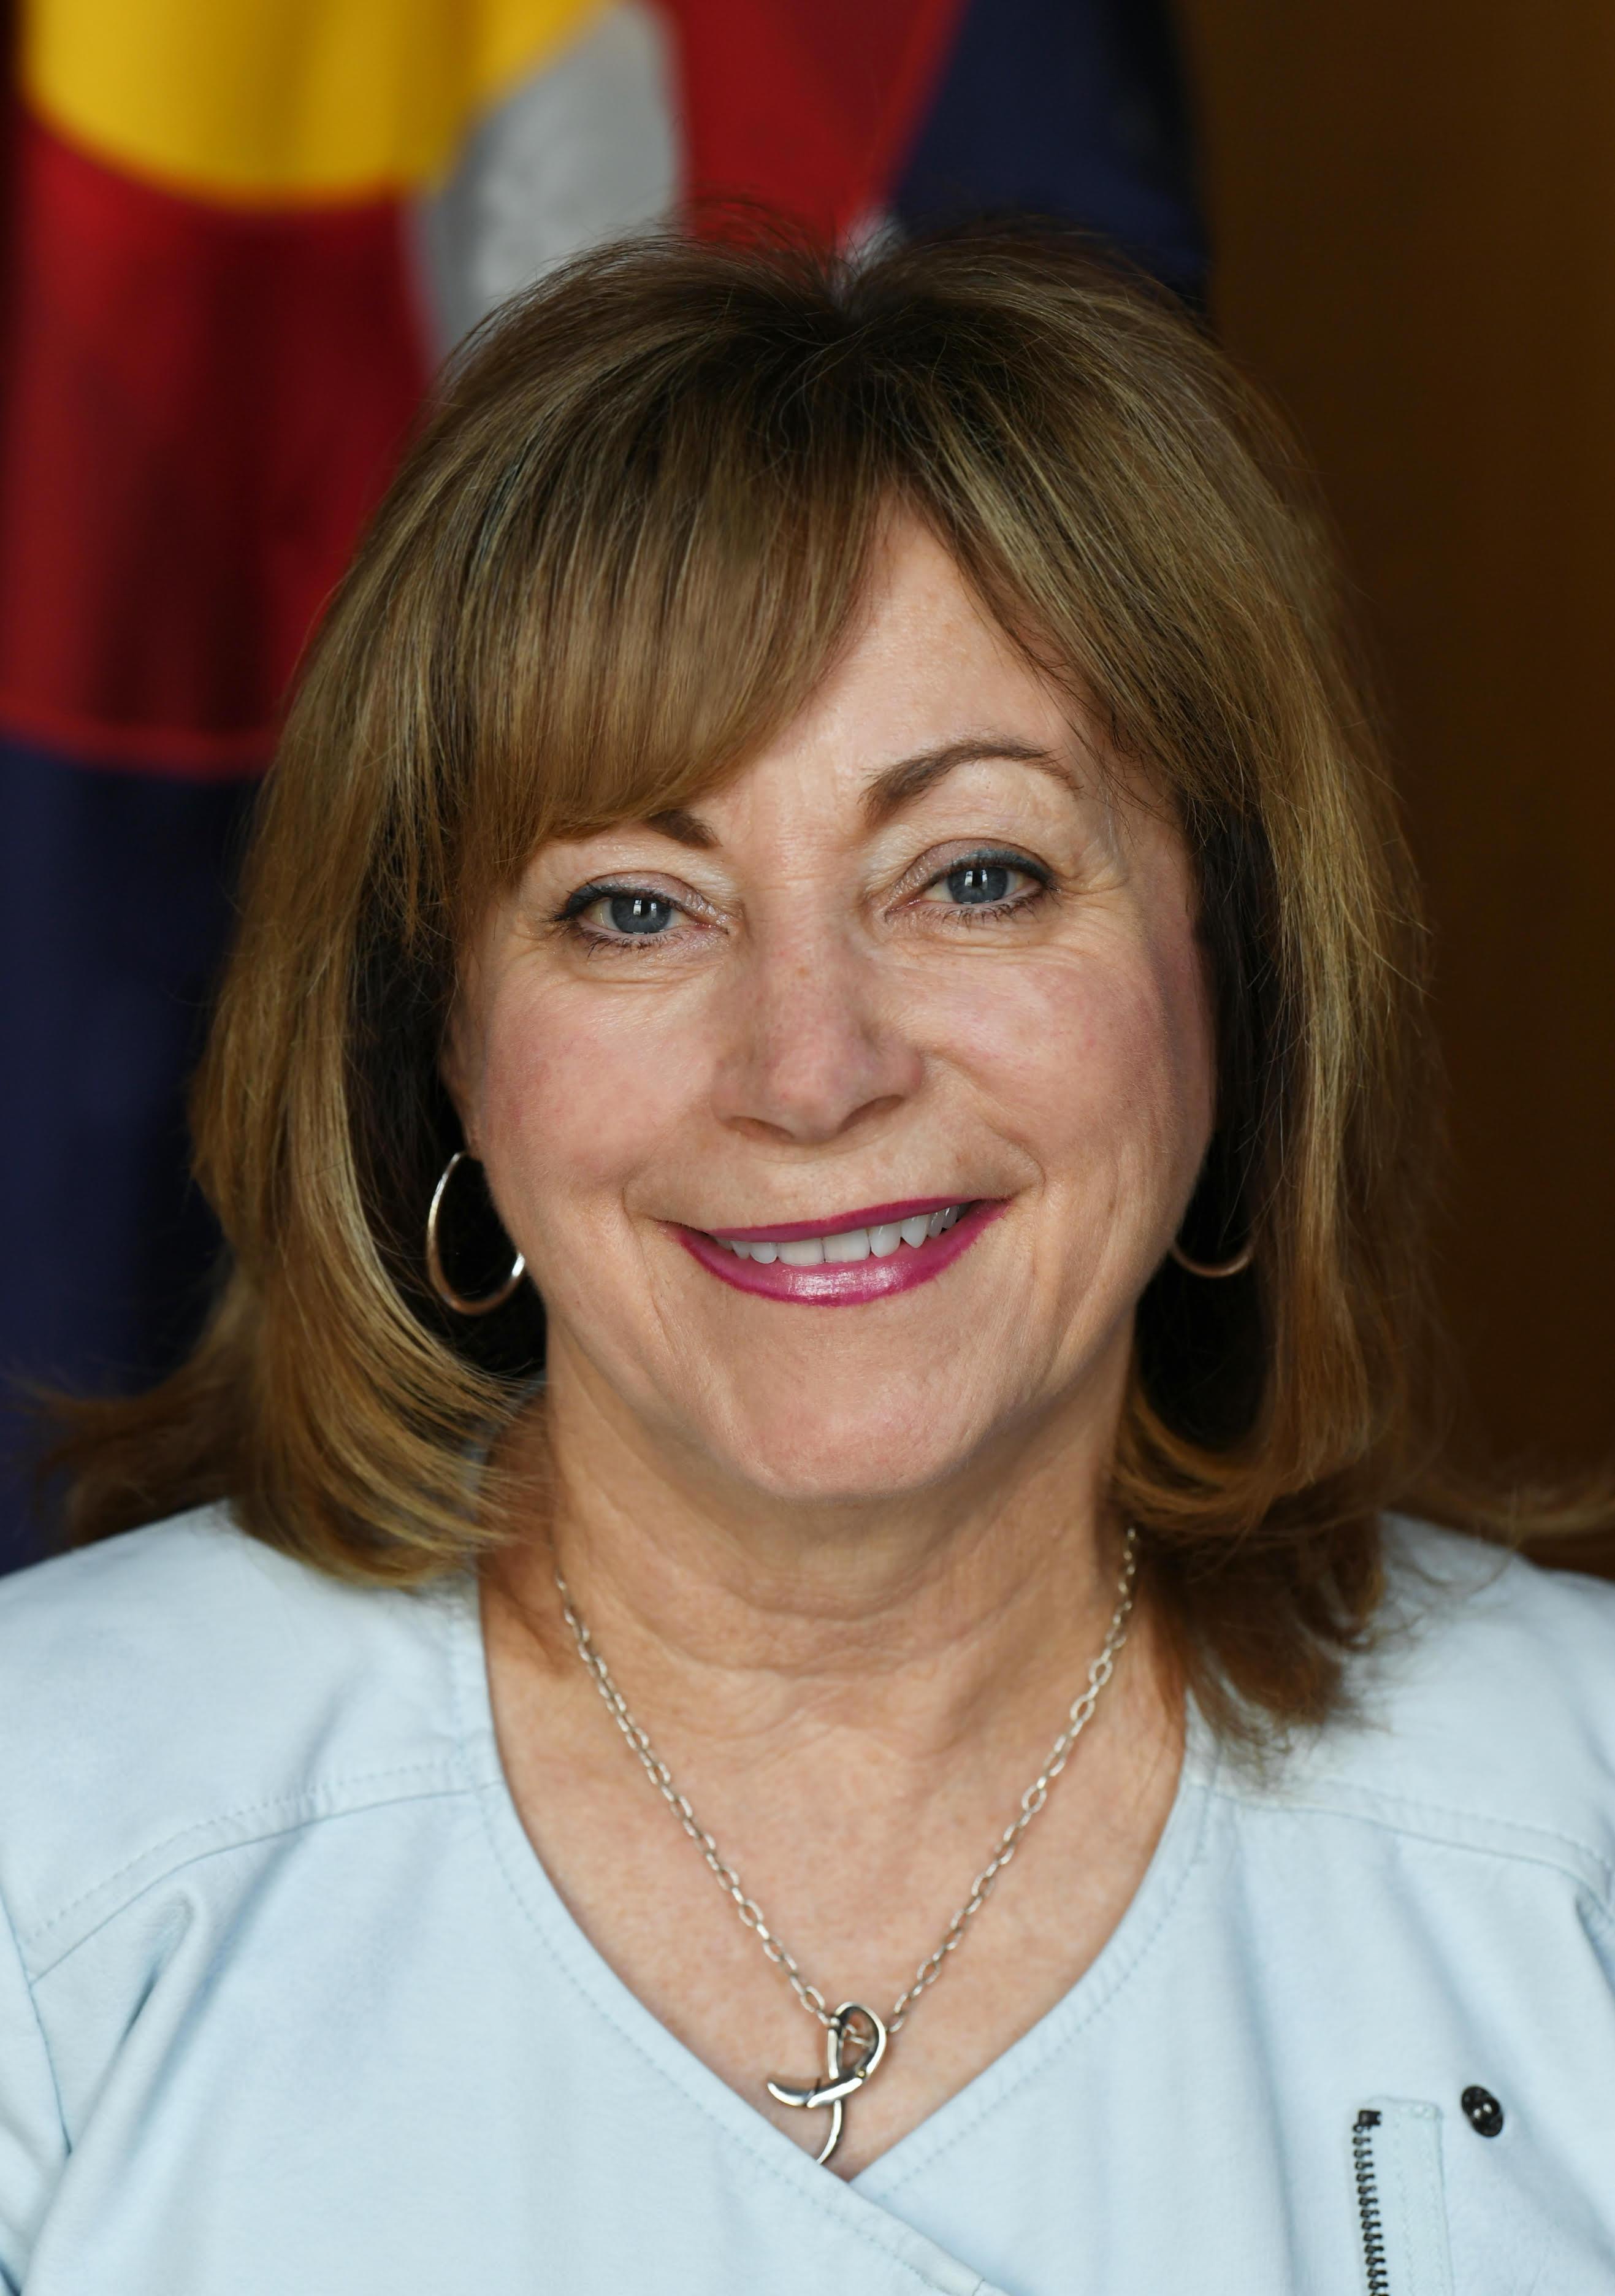 Dianne Primavera, Lt. Governor, State of Colorado